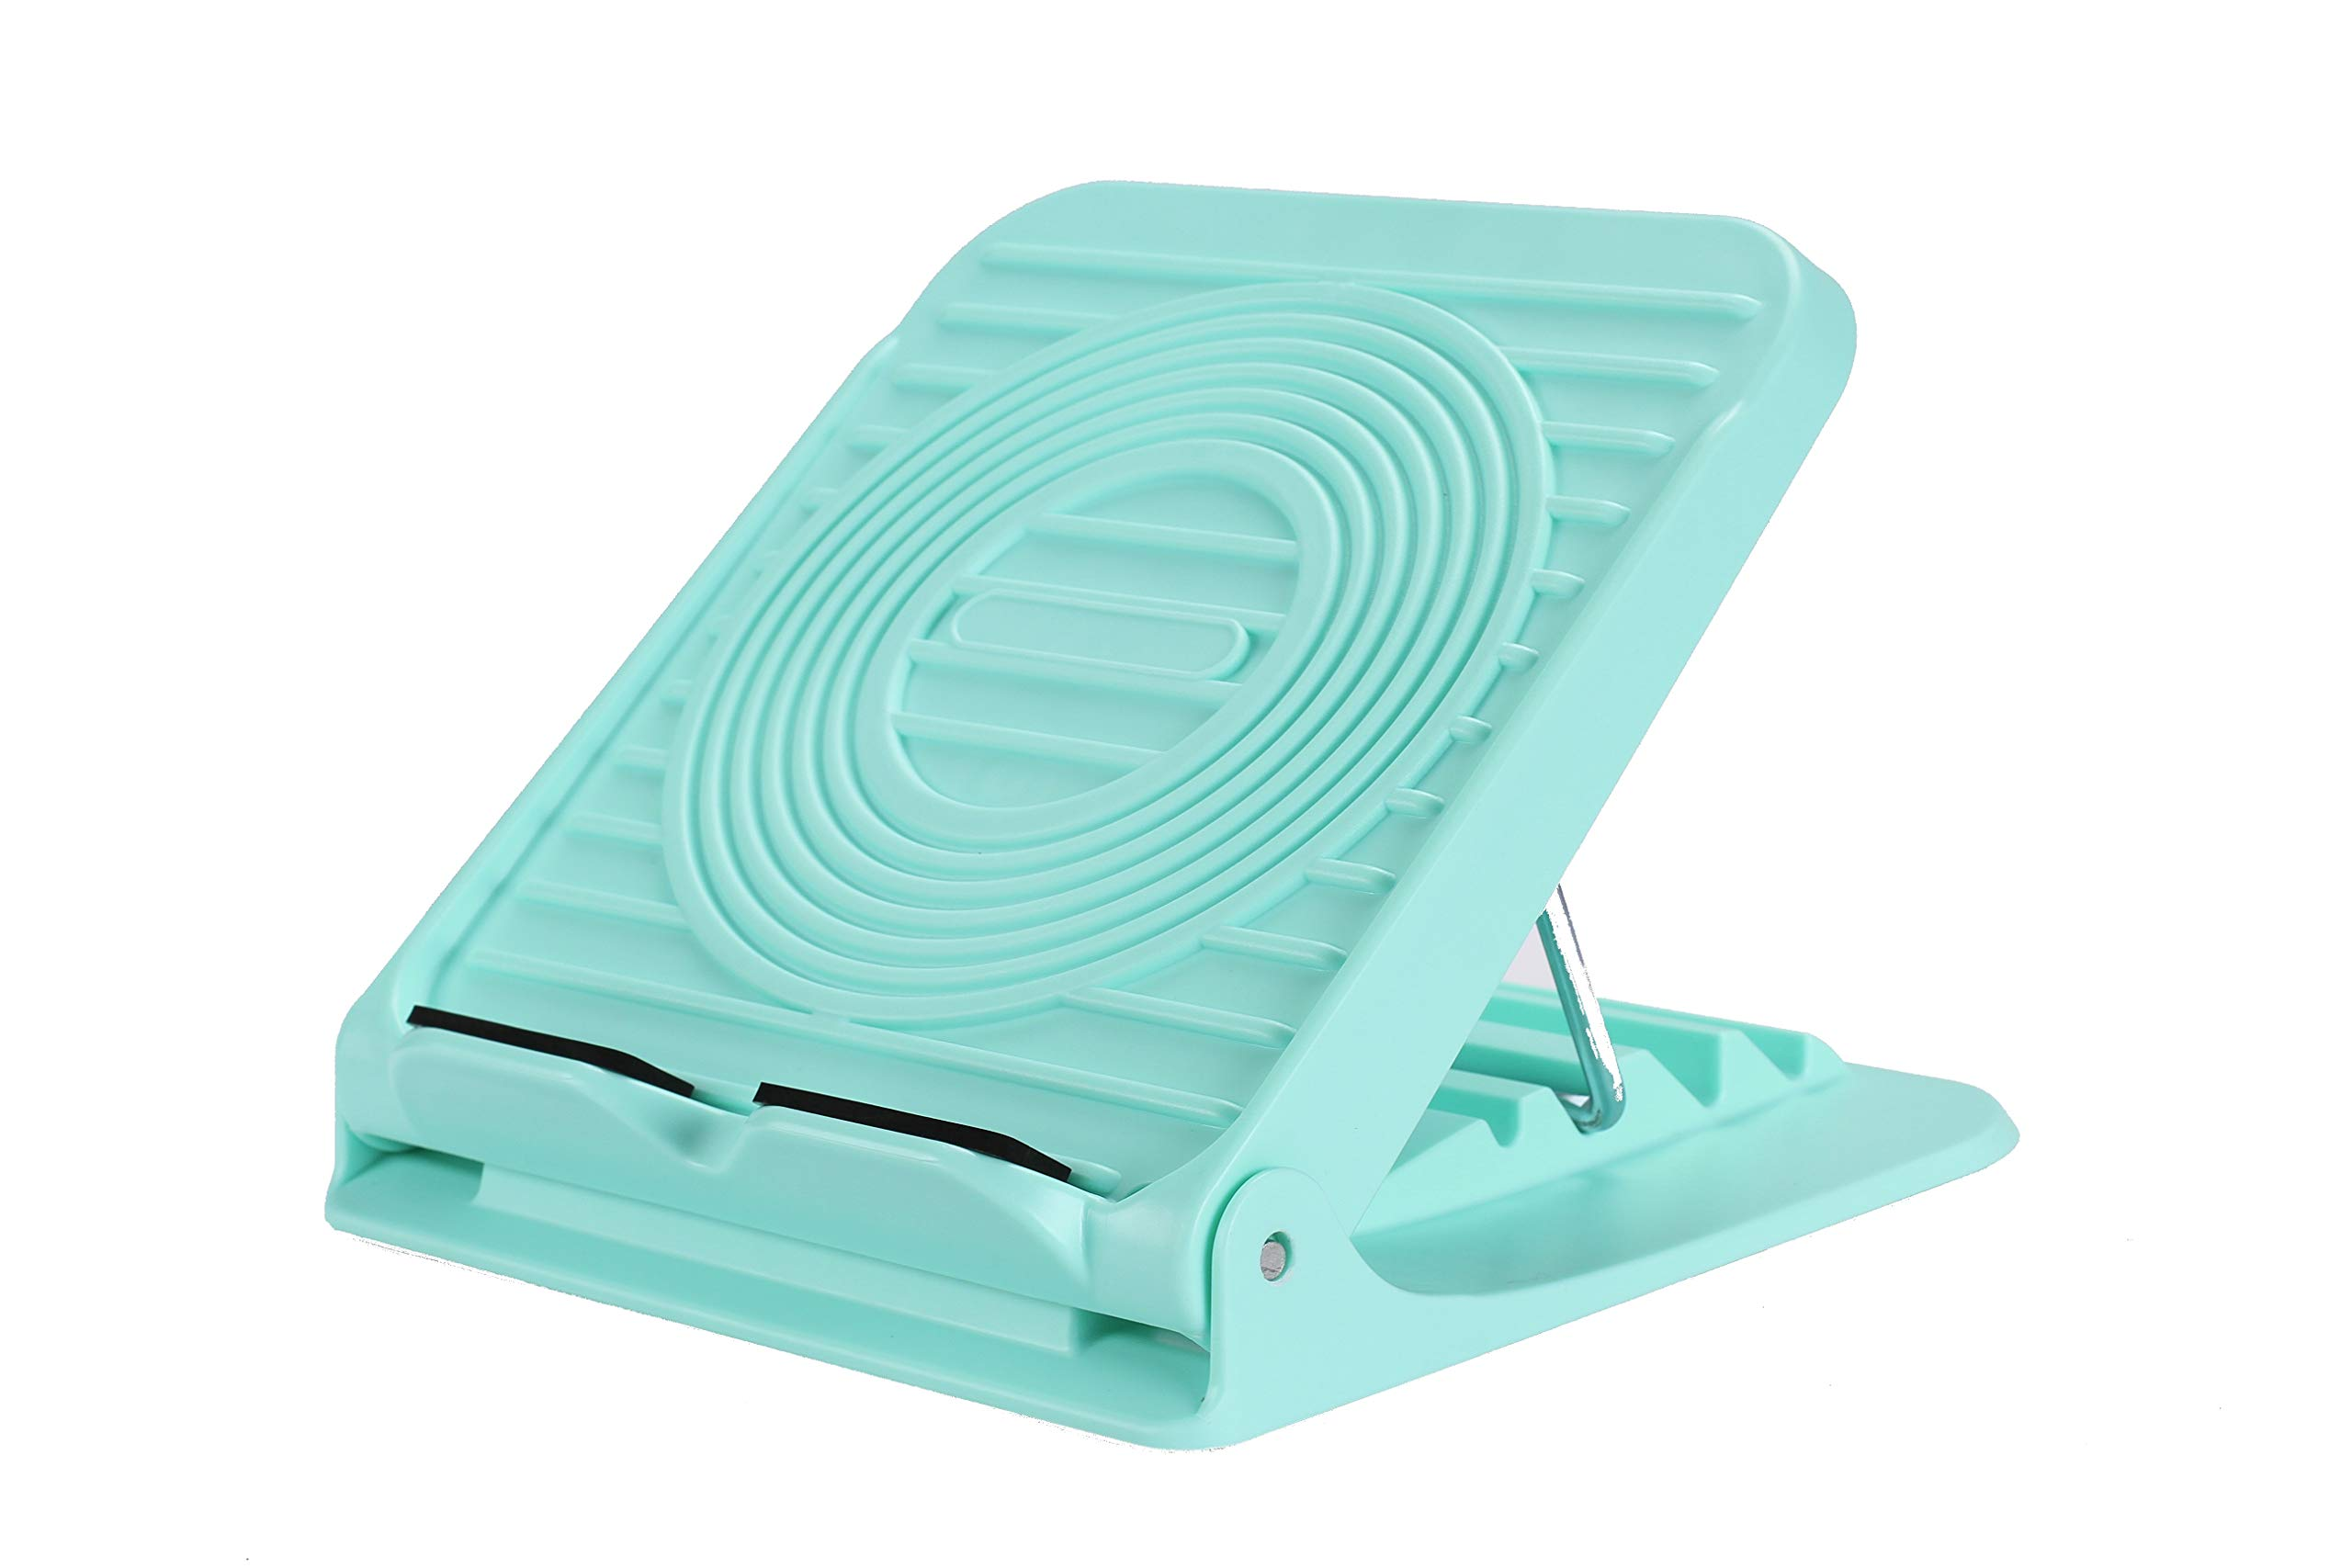 LOVHO Adjustable Slant Board Sports Equipment Leg Exercise Ankle Calf Stretcher Foot Balancing Board (Green)